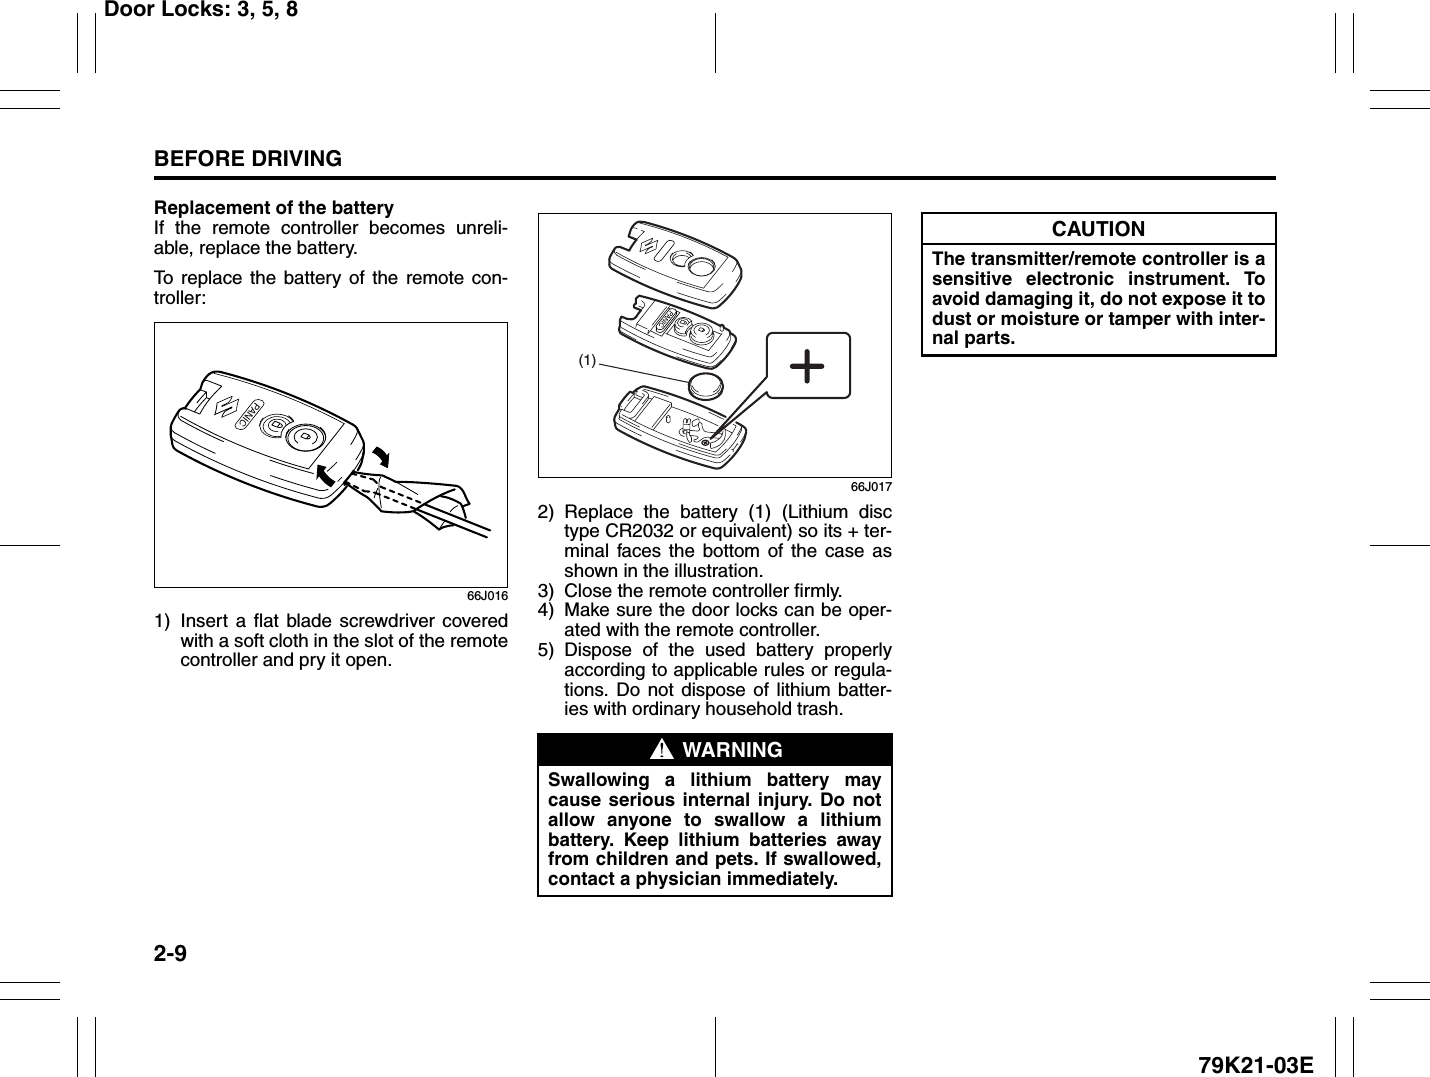 Suzuki 2010 Grand Vitara Owners Manual 13